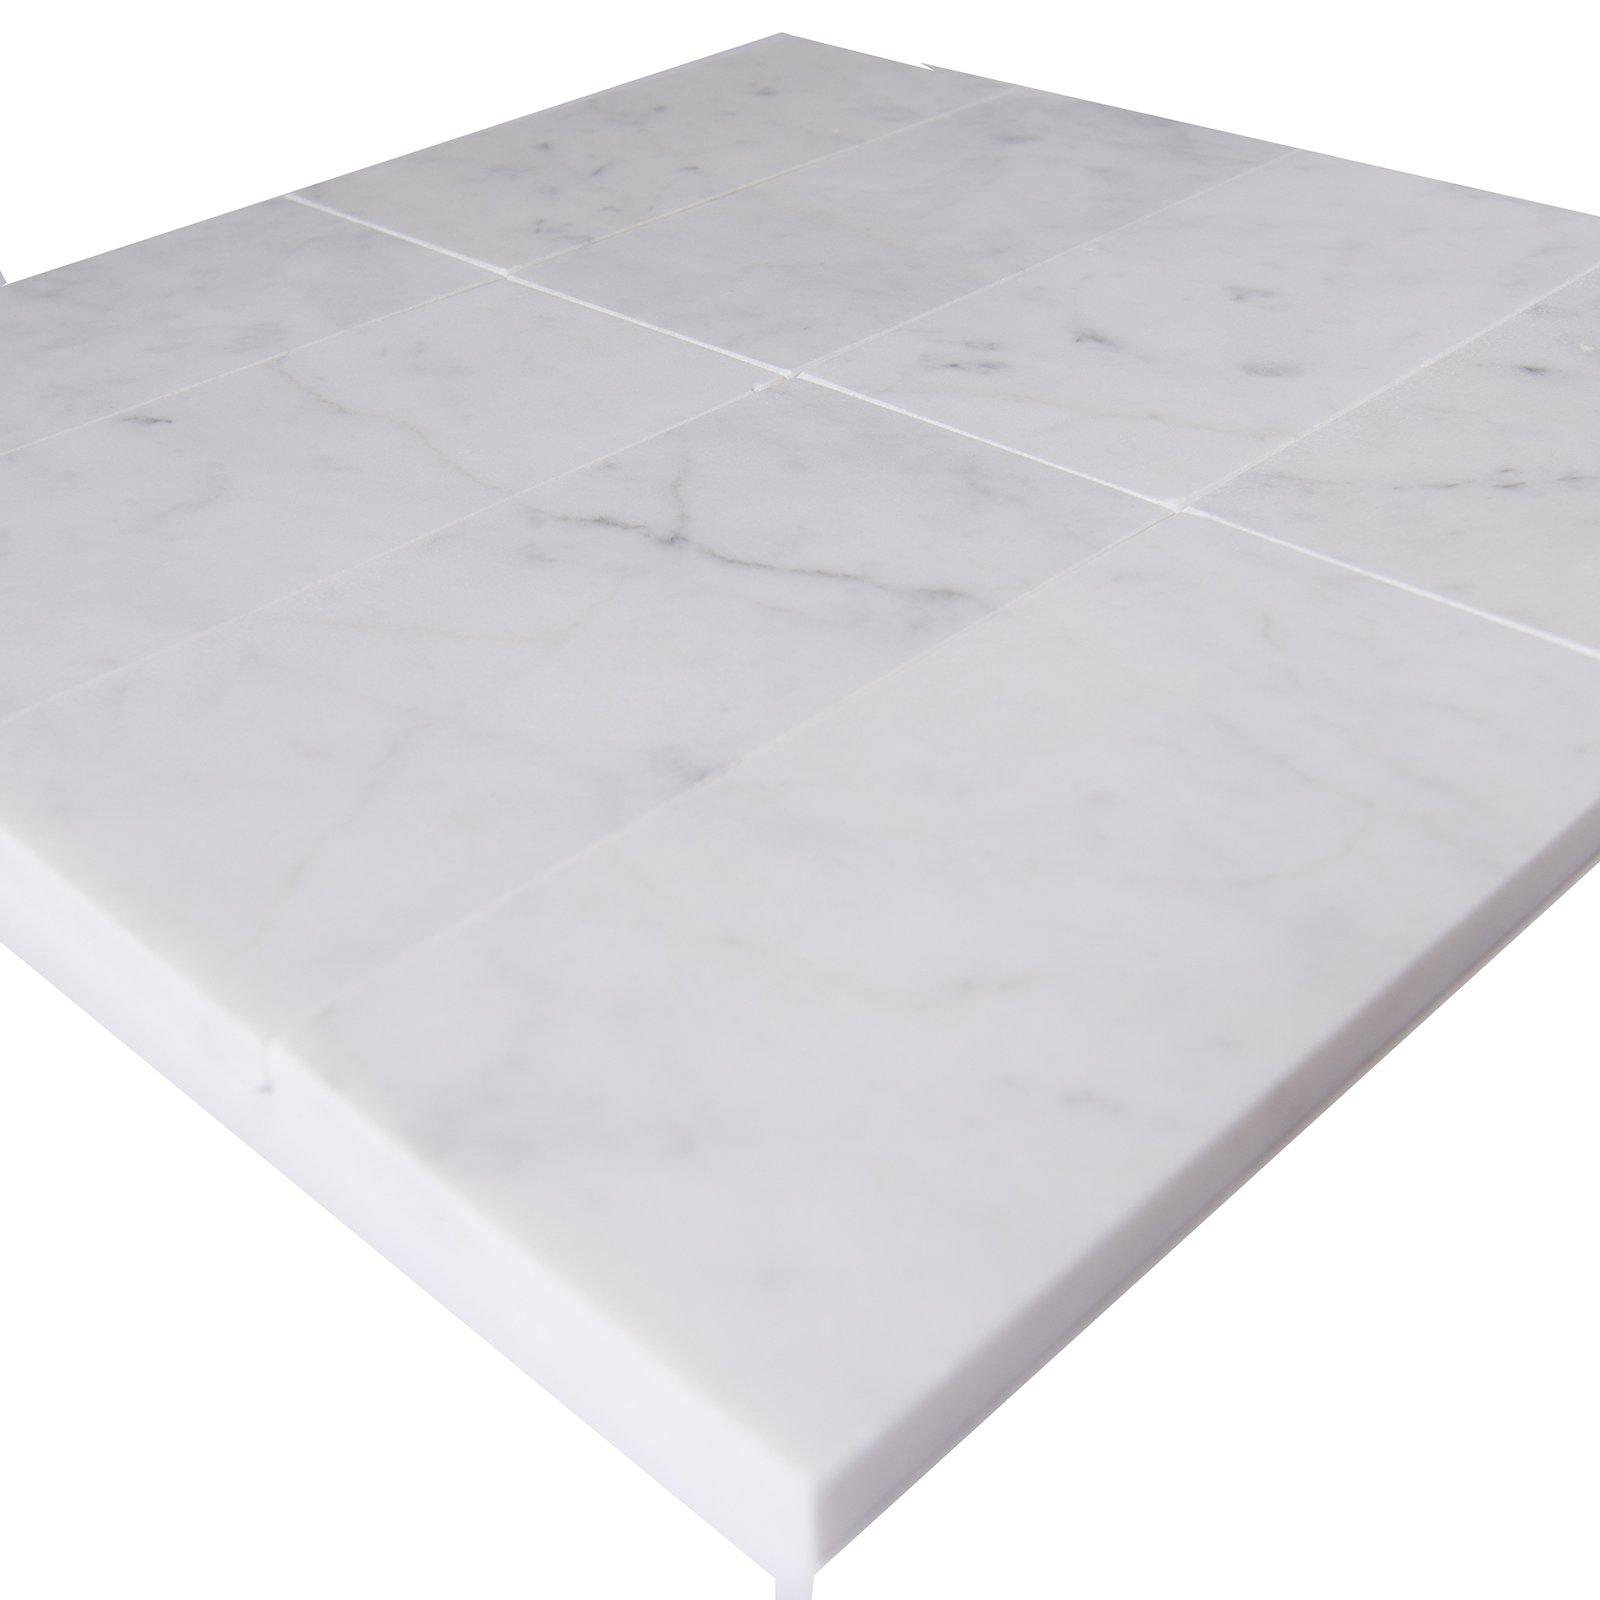 Carrara White Marble Field Tile, CWMT0306-H, 3''X6''X3/8'' Subway Tile, Honed (Box of 40 Pieces)